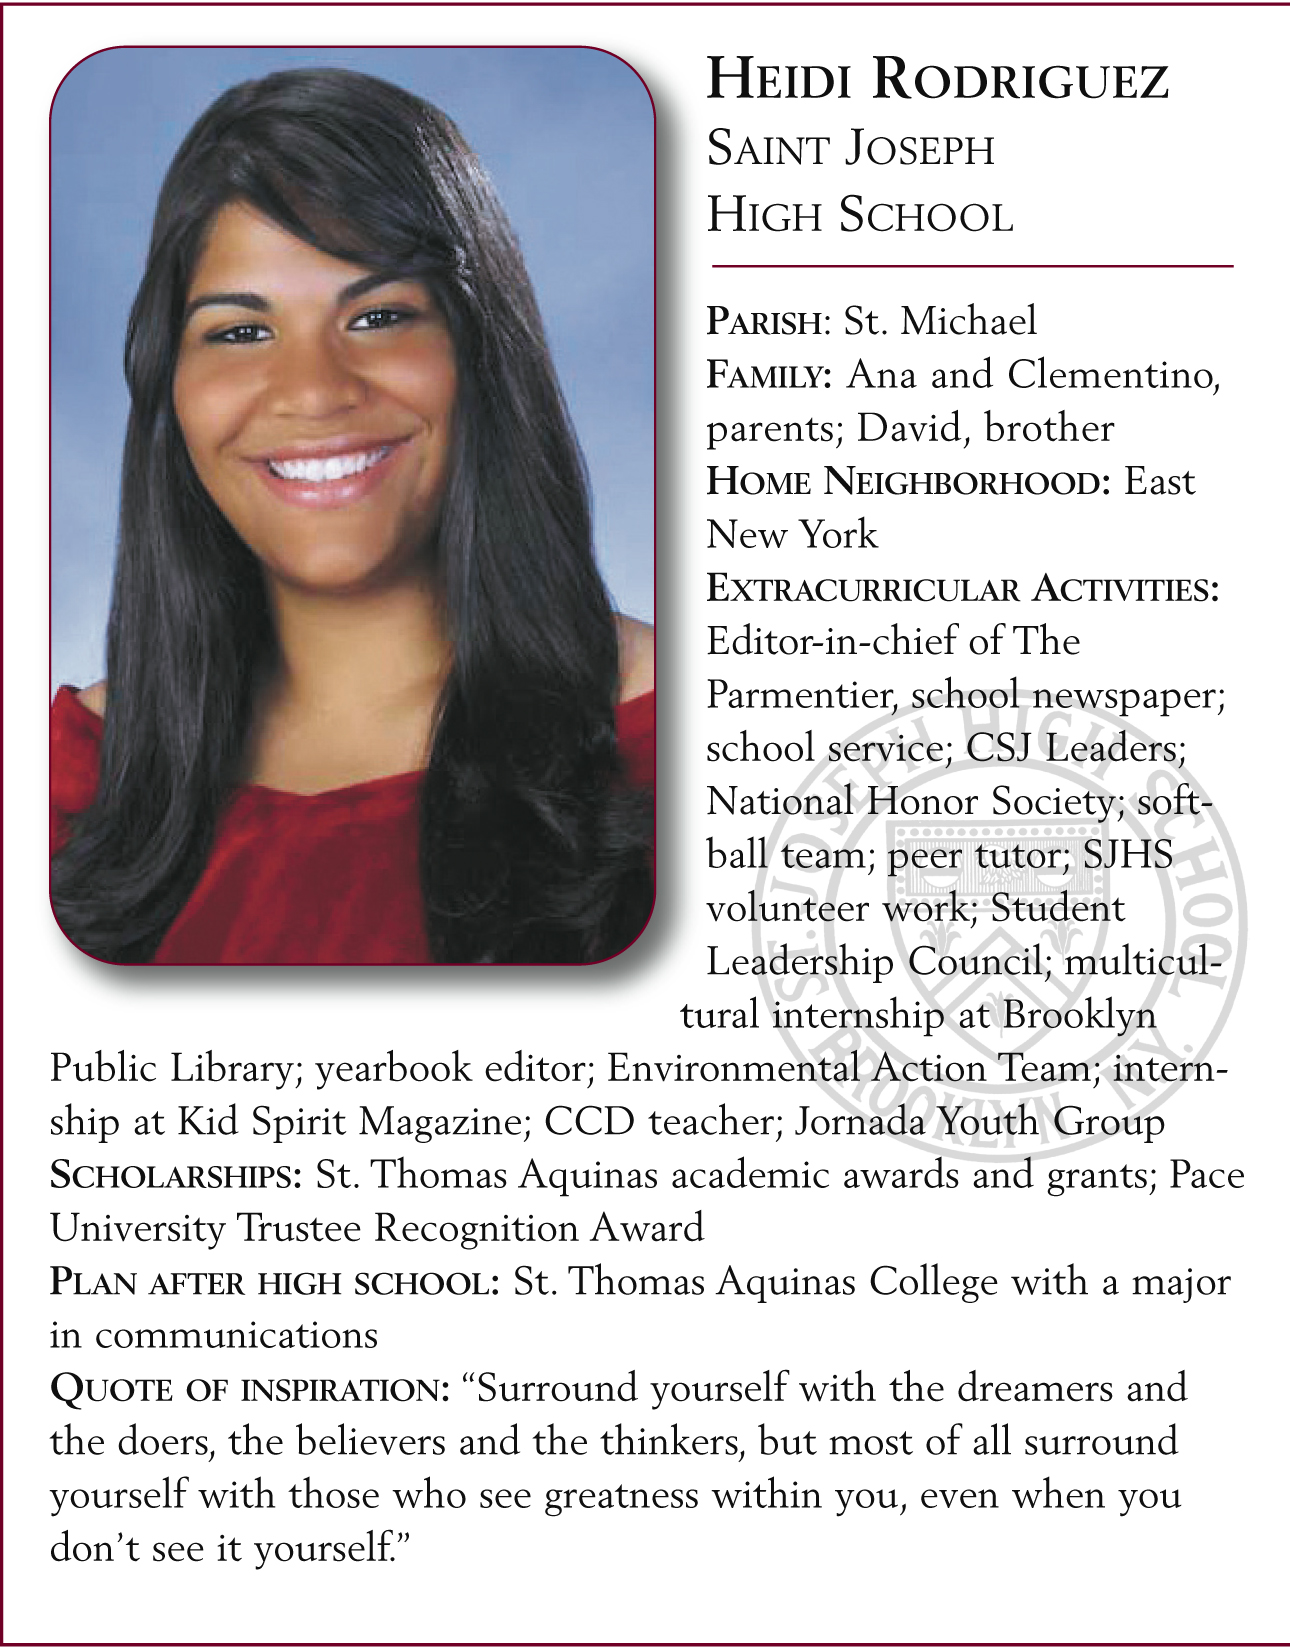 Heidi Rodriguez, St. Joseph High School